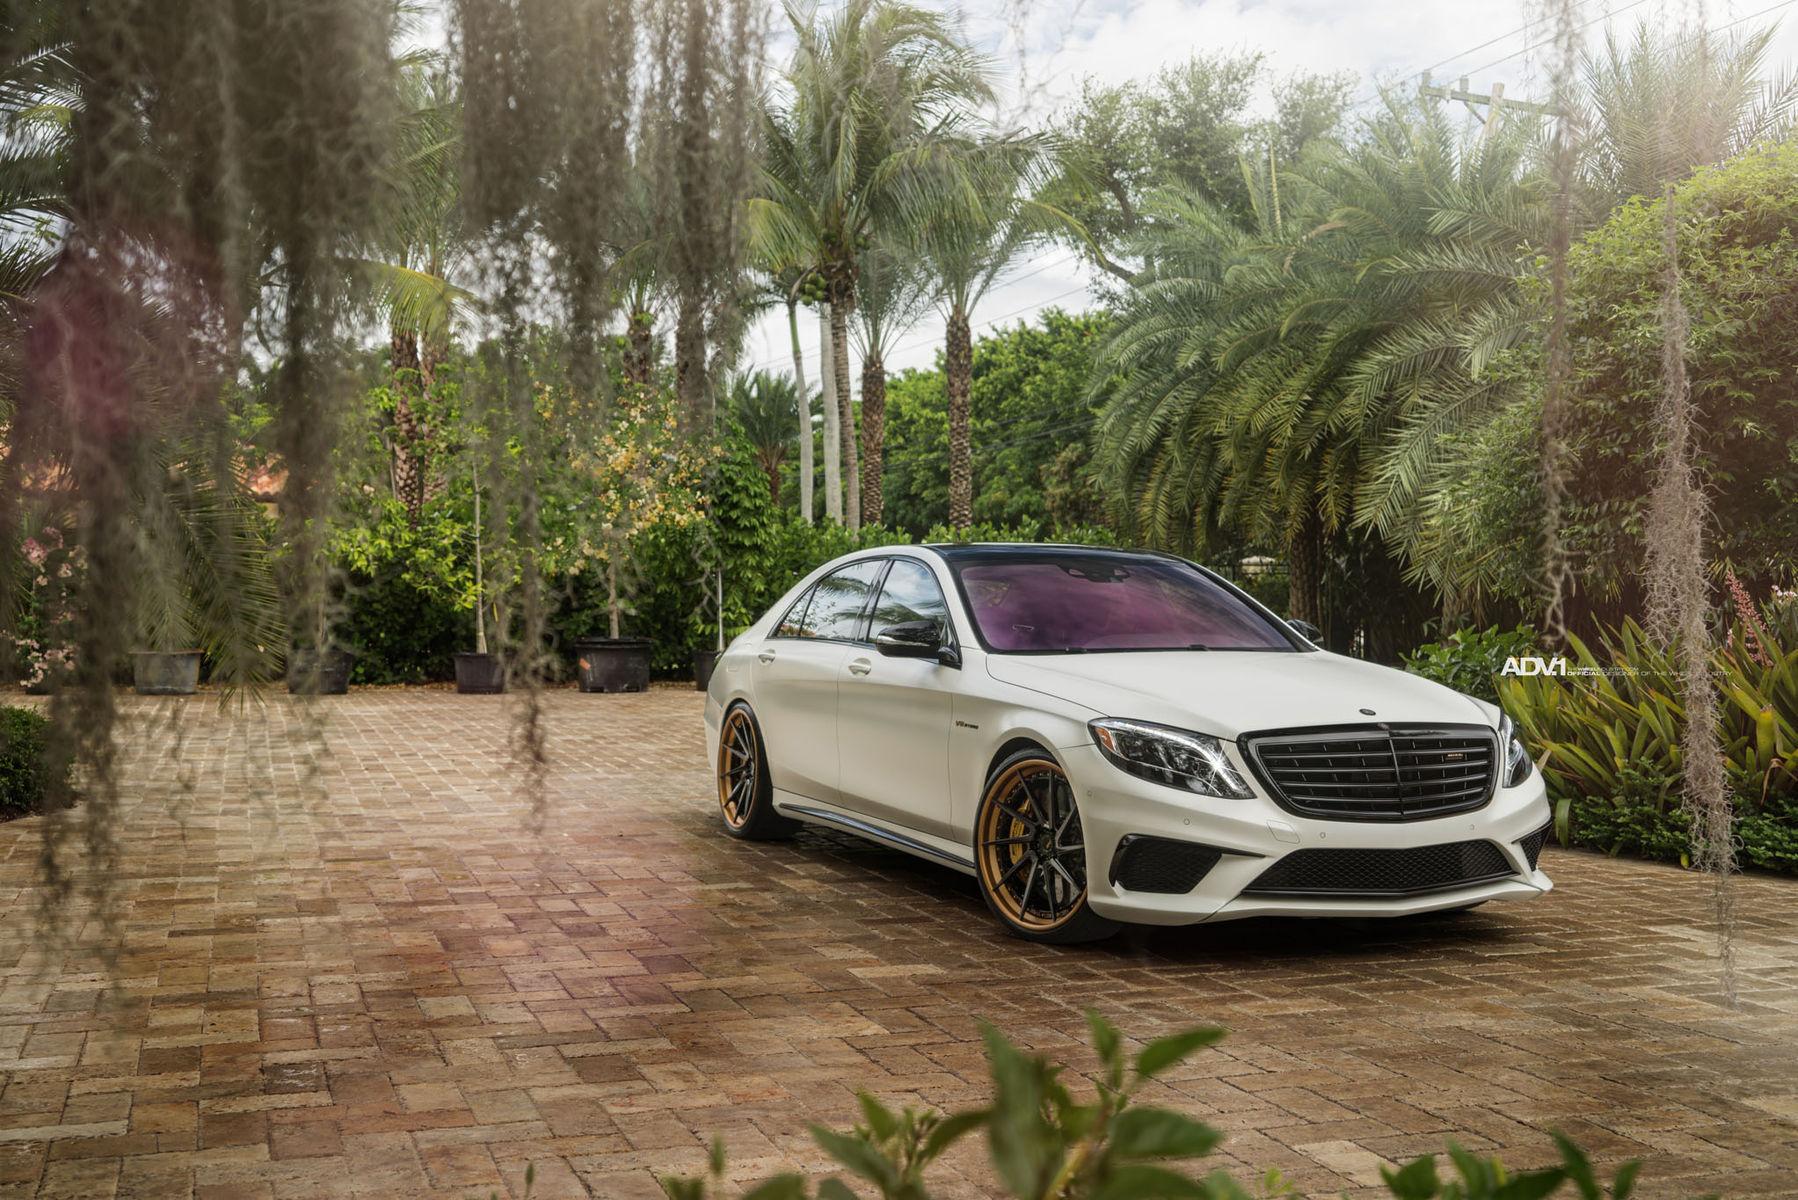 Mercedes-Benz S-Class | ADV.1 Mercedes S63 AMG Sedan